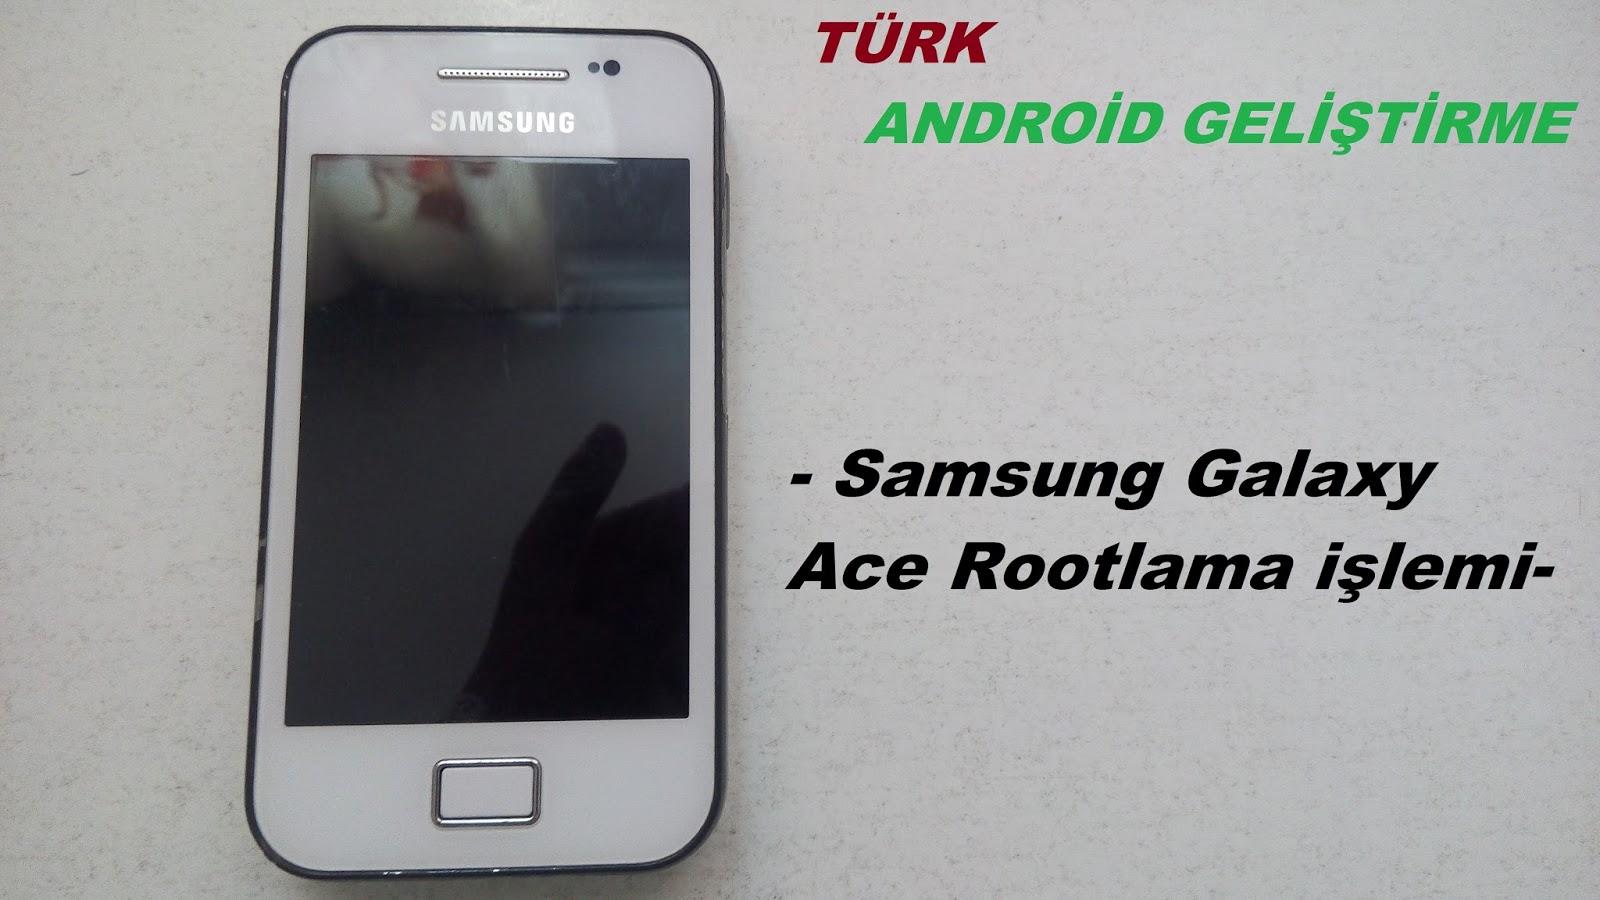 Samsung Galaxy Ace GT-S5830i Root Atma Güncel | Türk Android